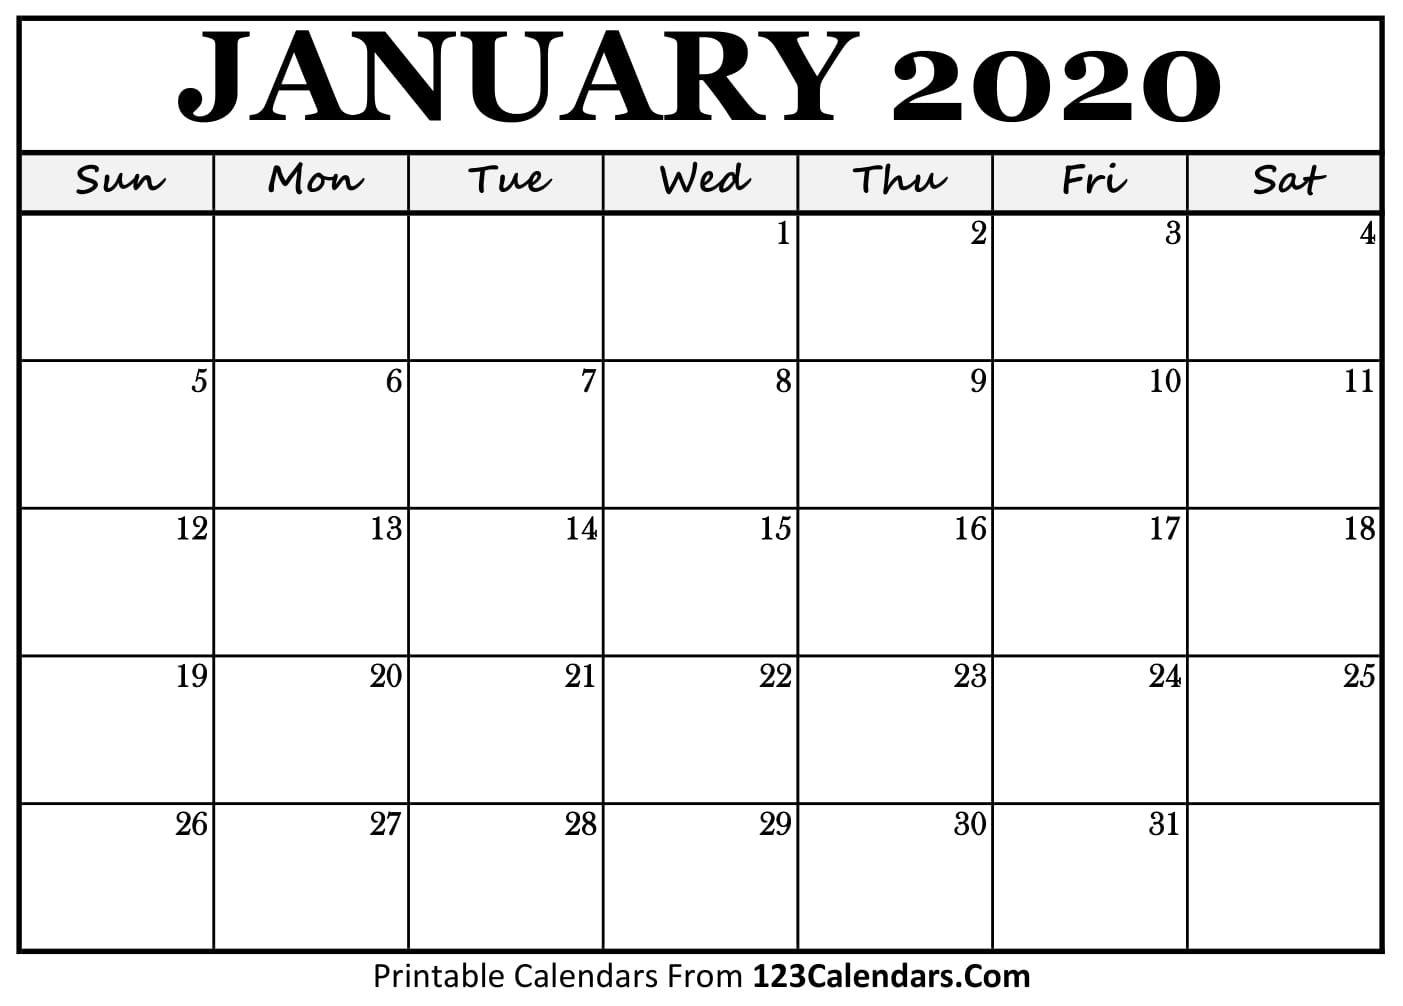 Free Printable Calendar | 123Calendars